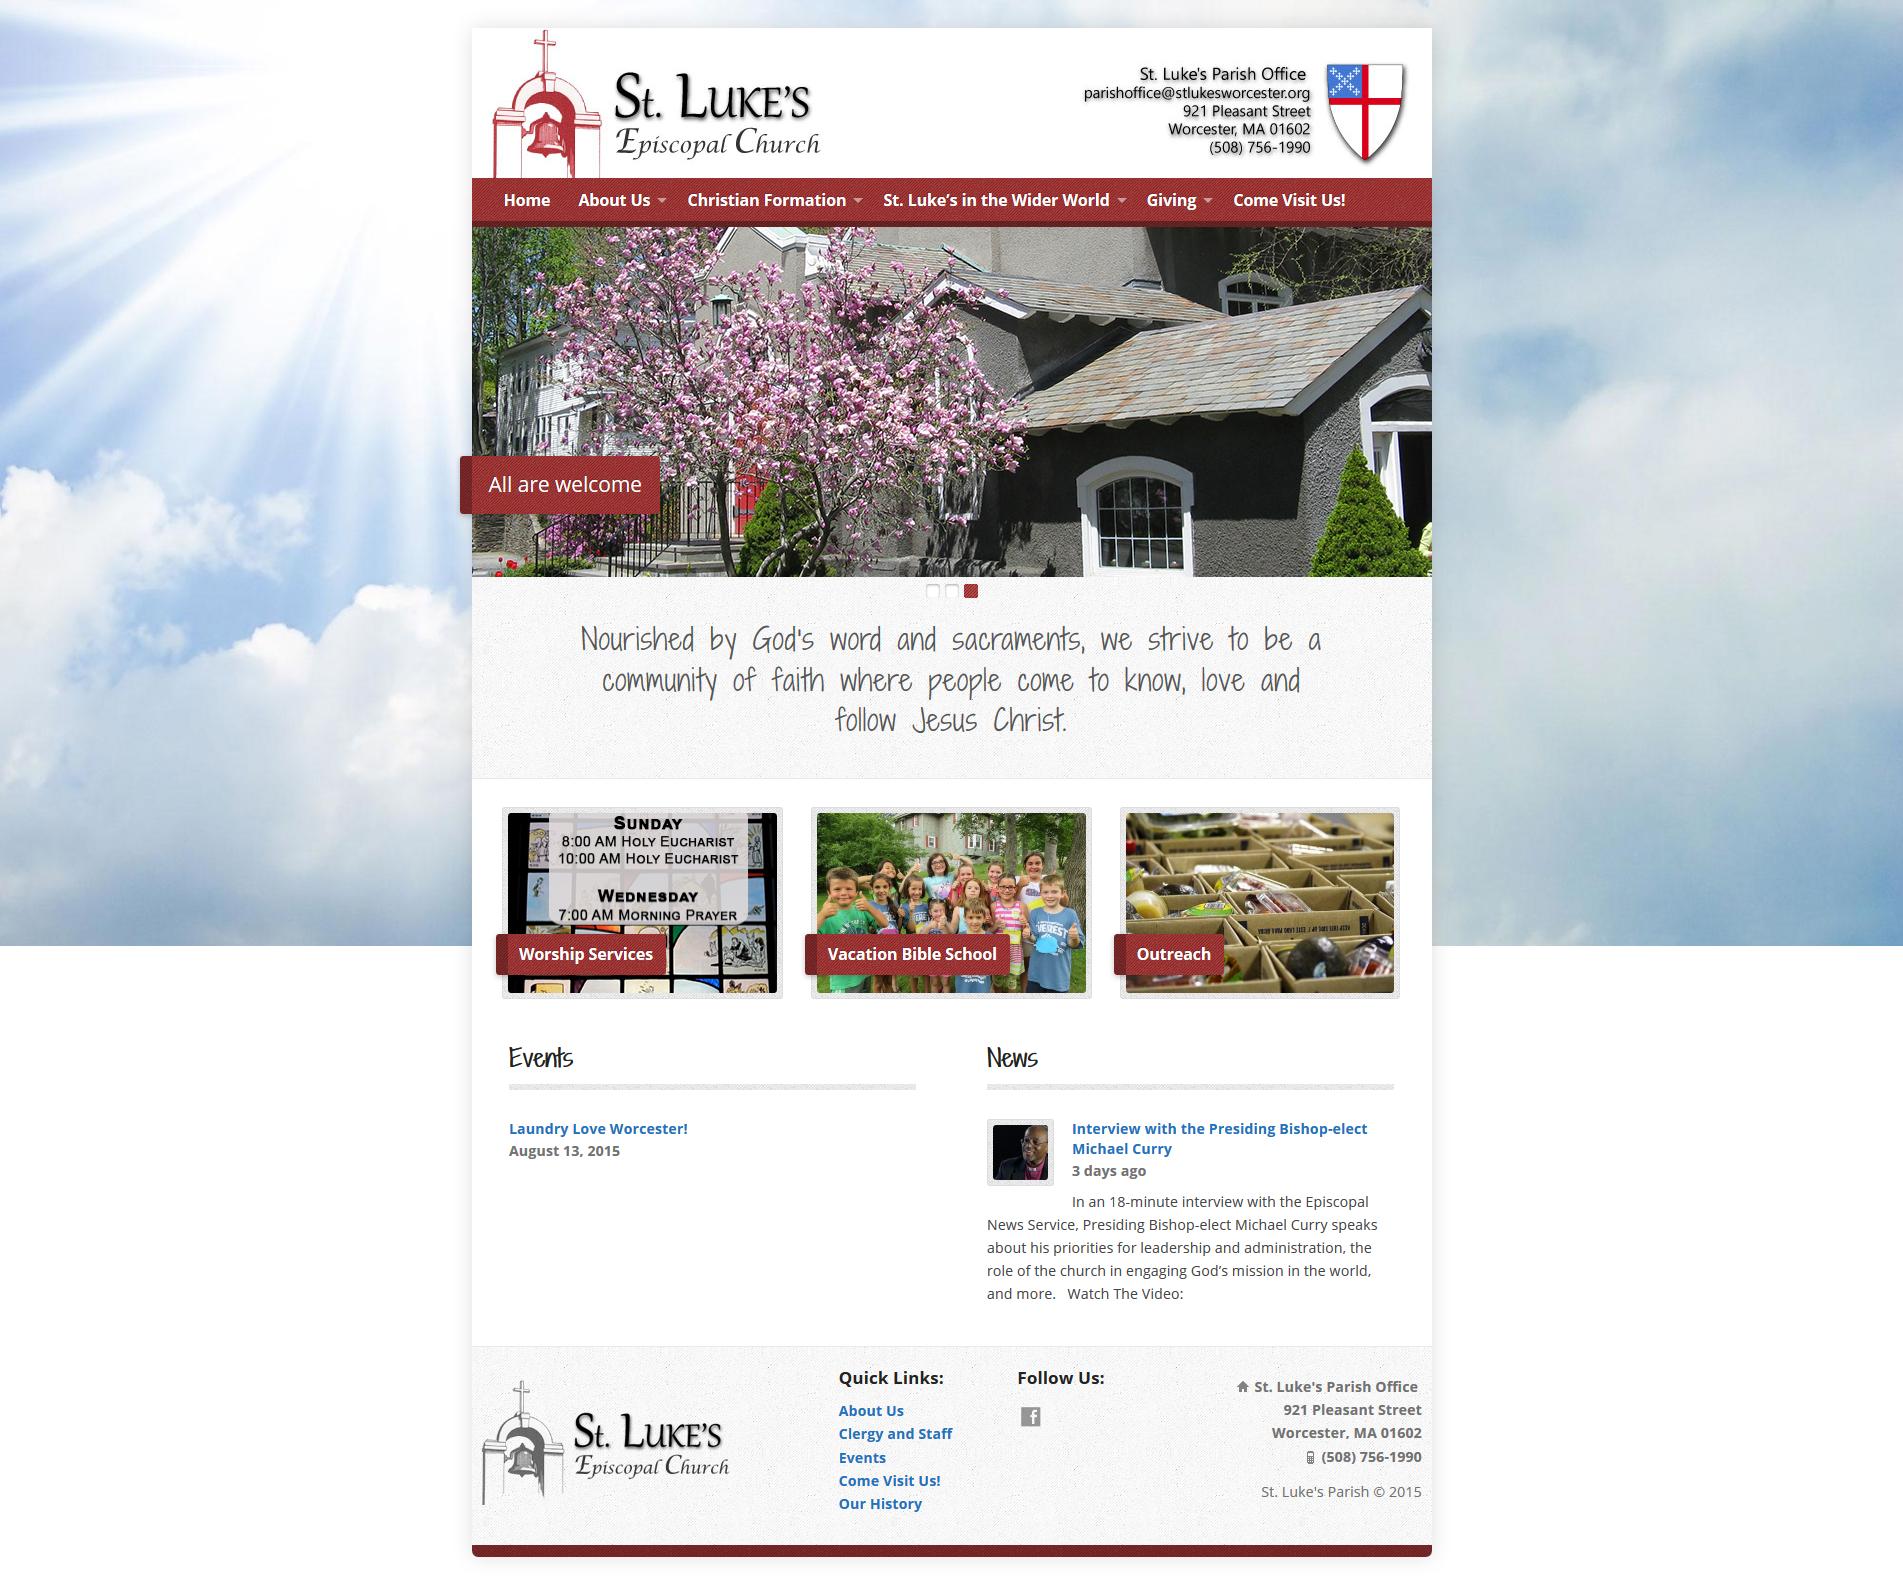 Saint Luke's Episcopal Church - 2015-08-04 11-08-34